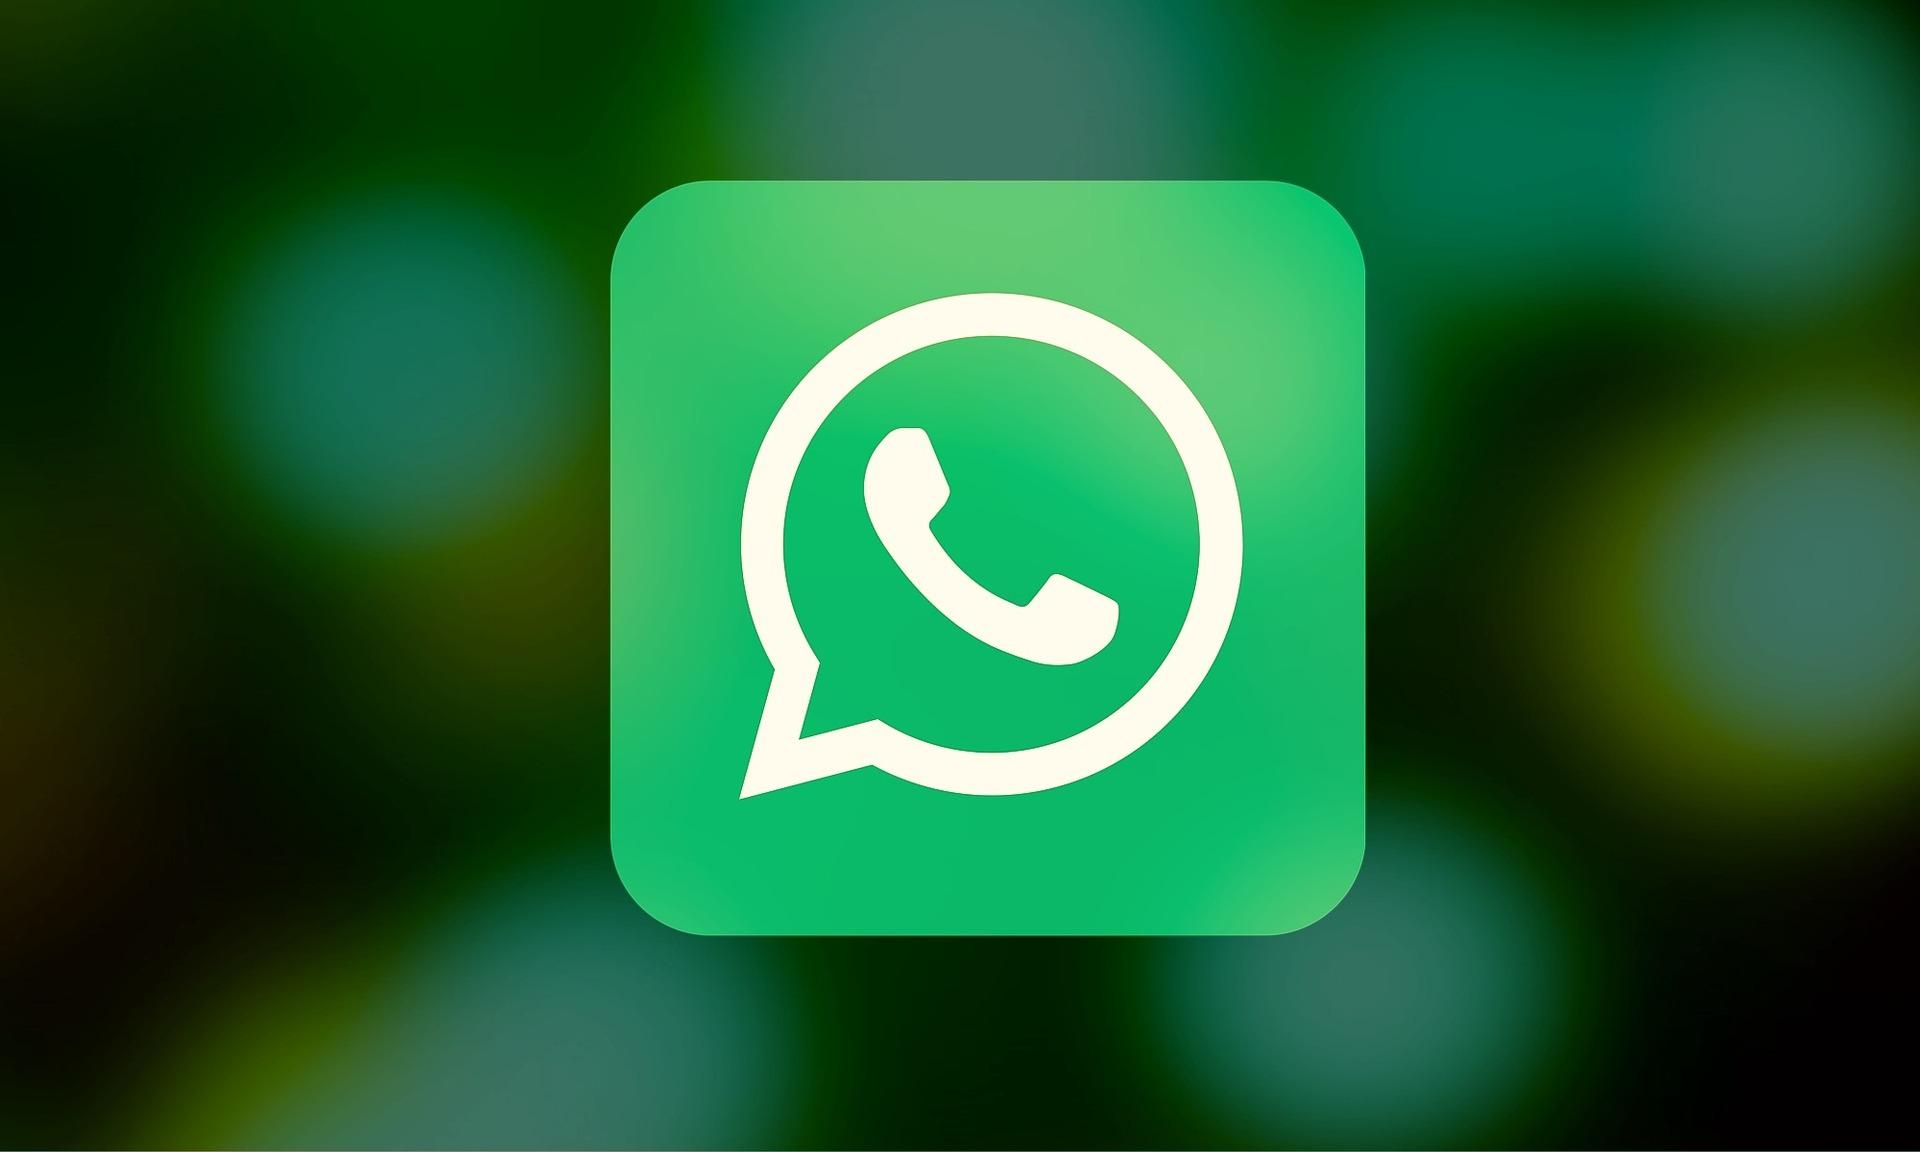 WhatApp กำลังกลายเป็นทางเลือกใหม่เพื่อรับข่าวสารนอกจาก Facebook